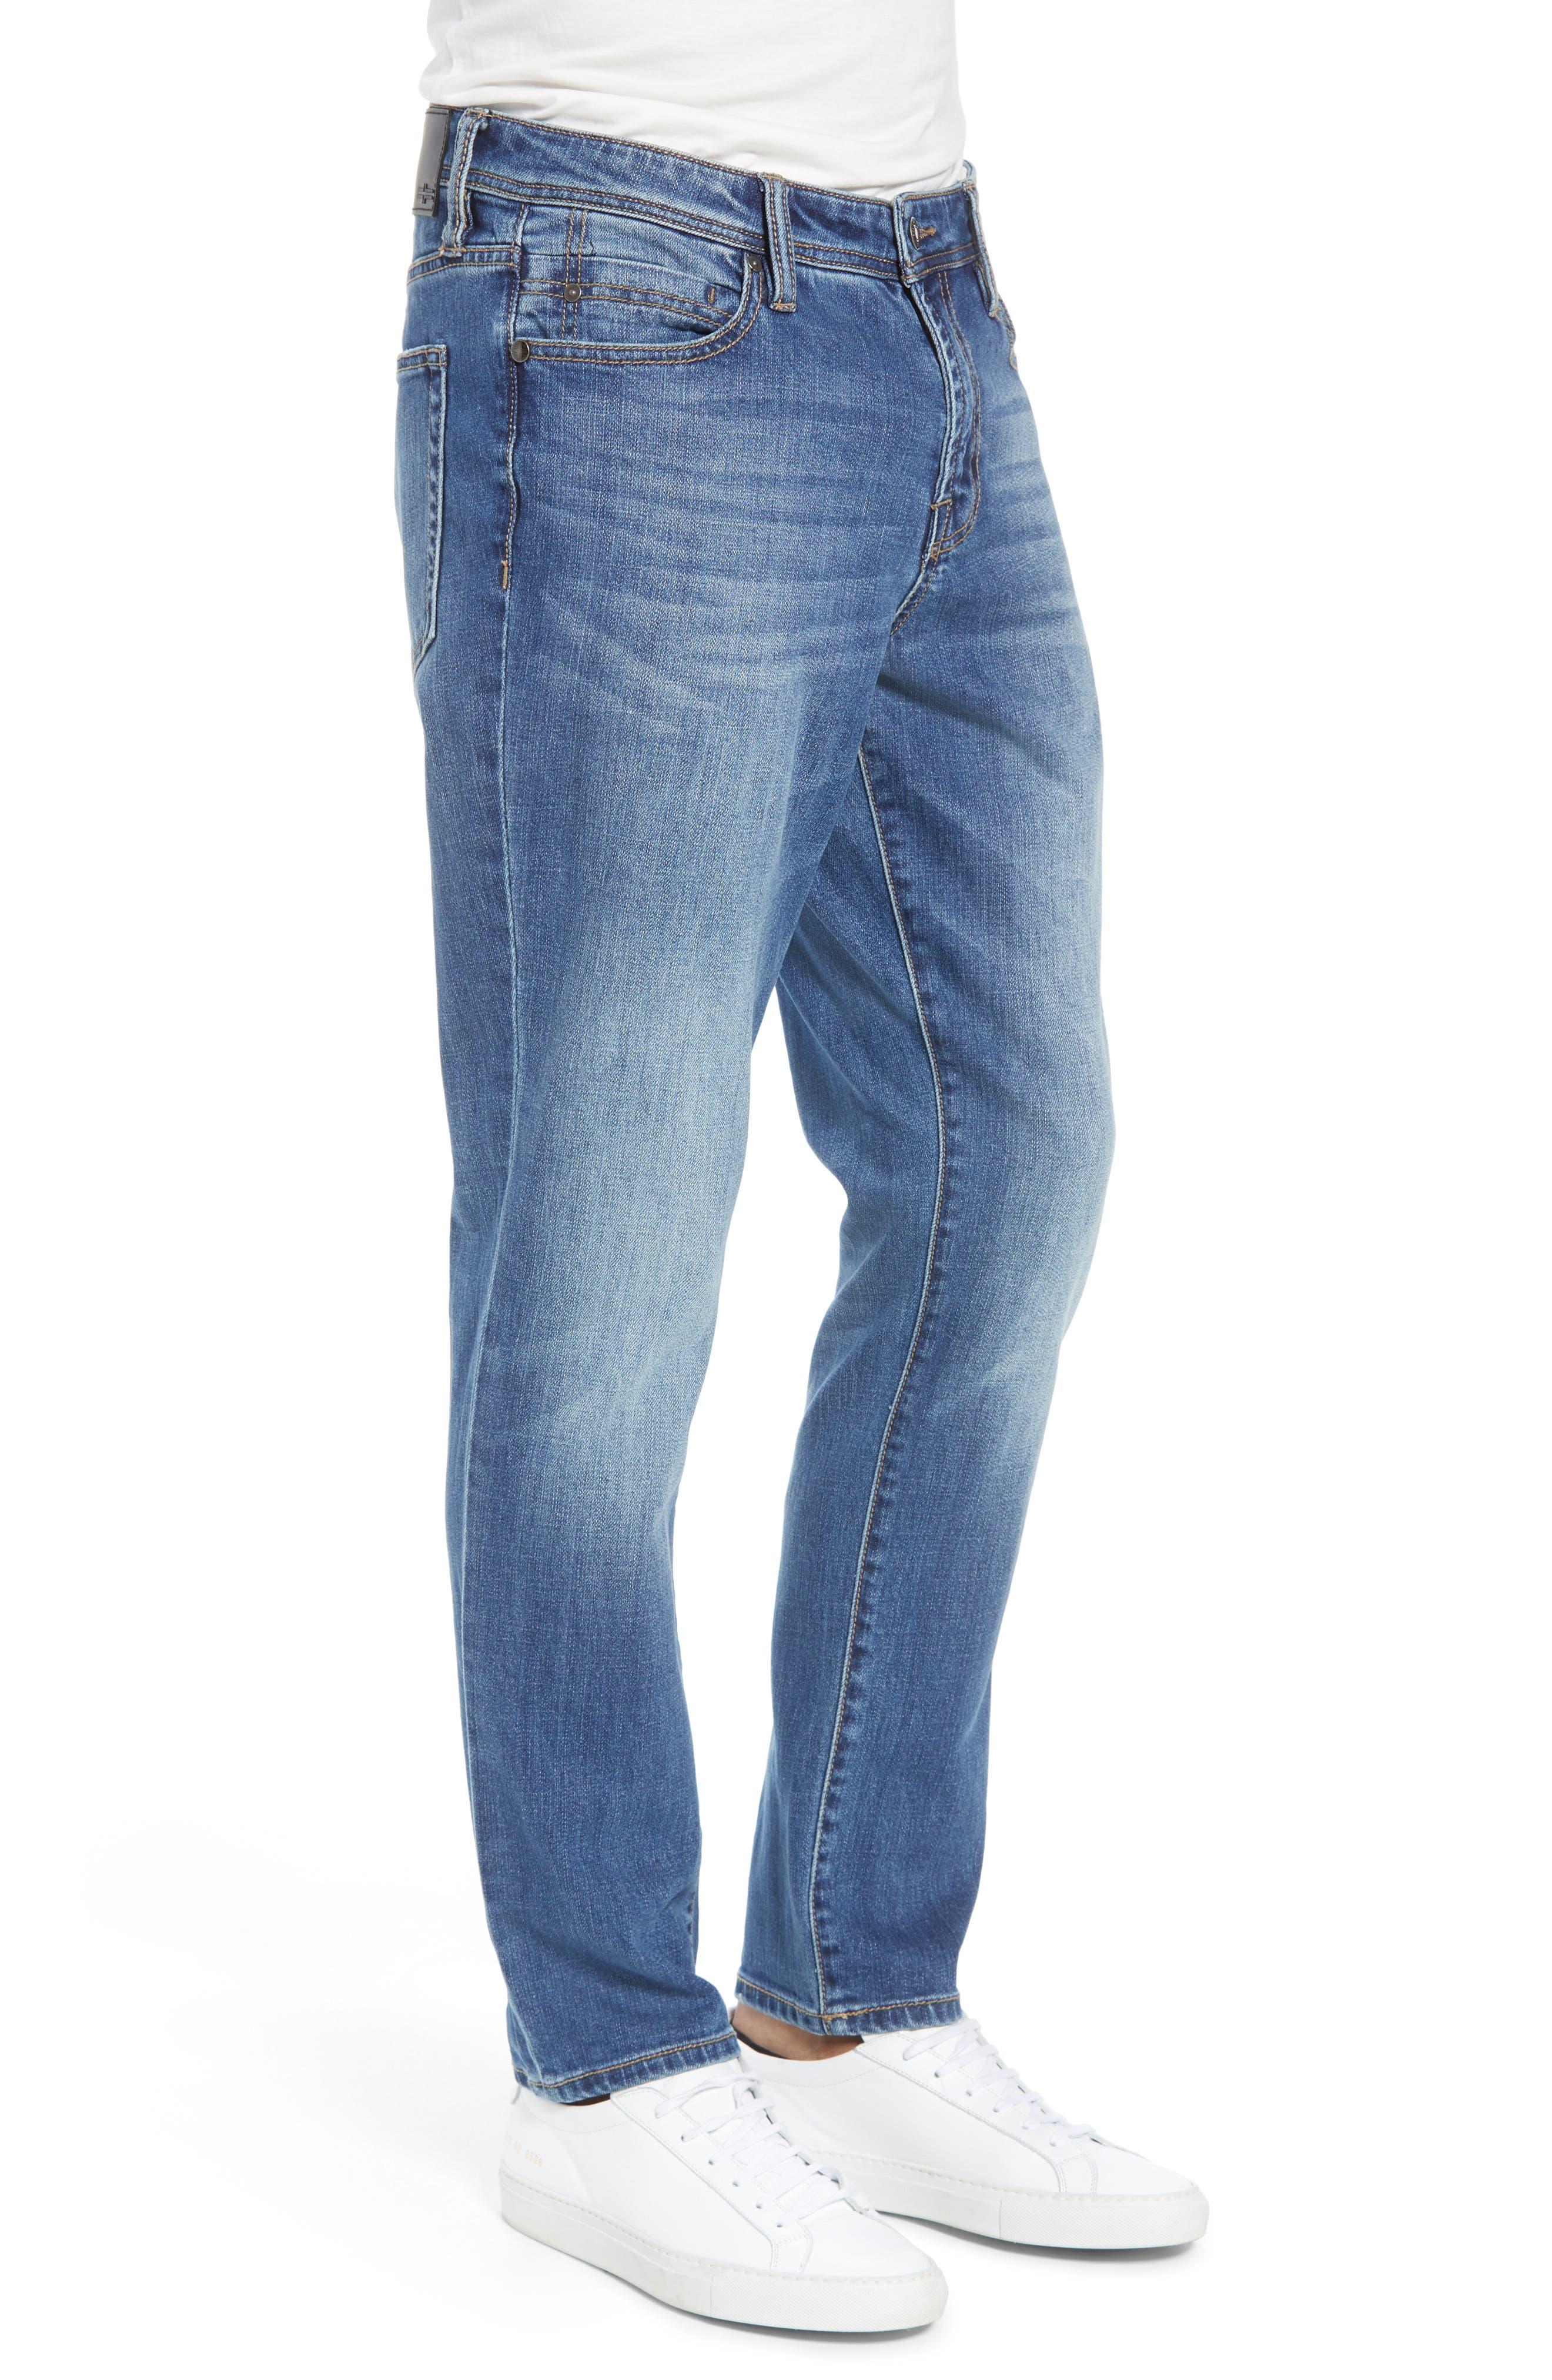 Jeans Co. Slim Straight Leg Jeans,                             Alternate thumbnail 3, color,                             BRYSON VINTAGE MED